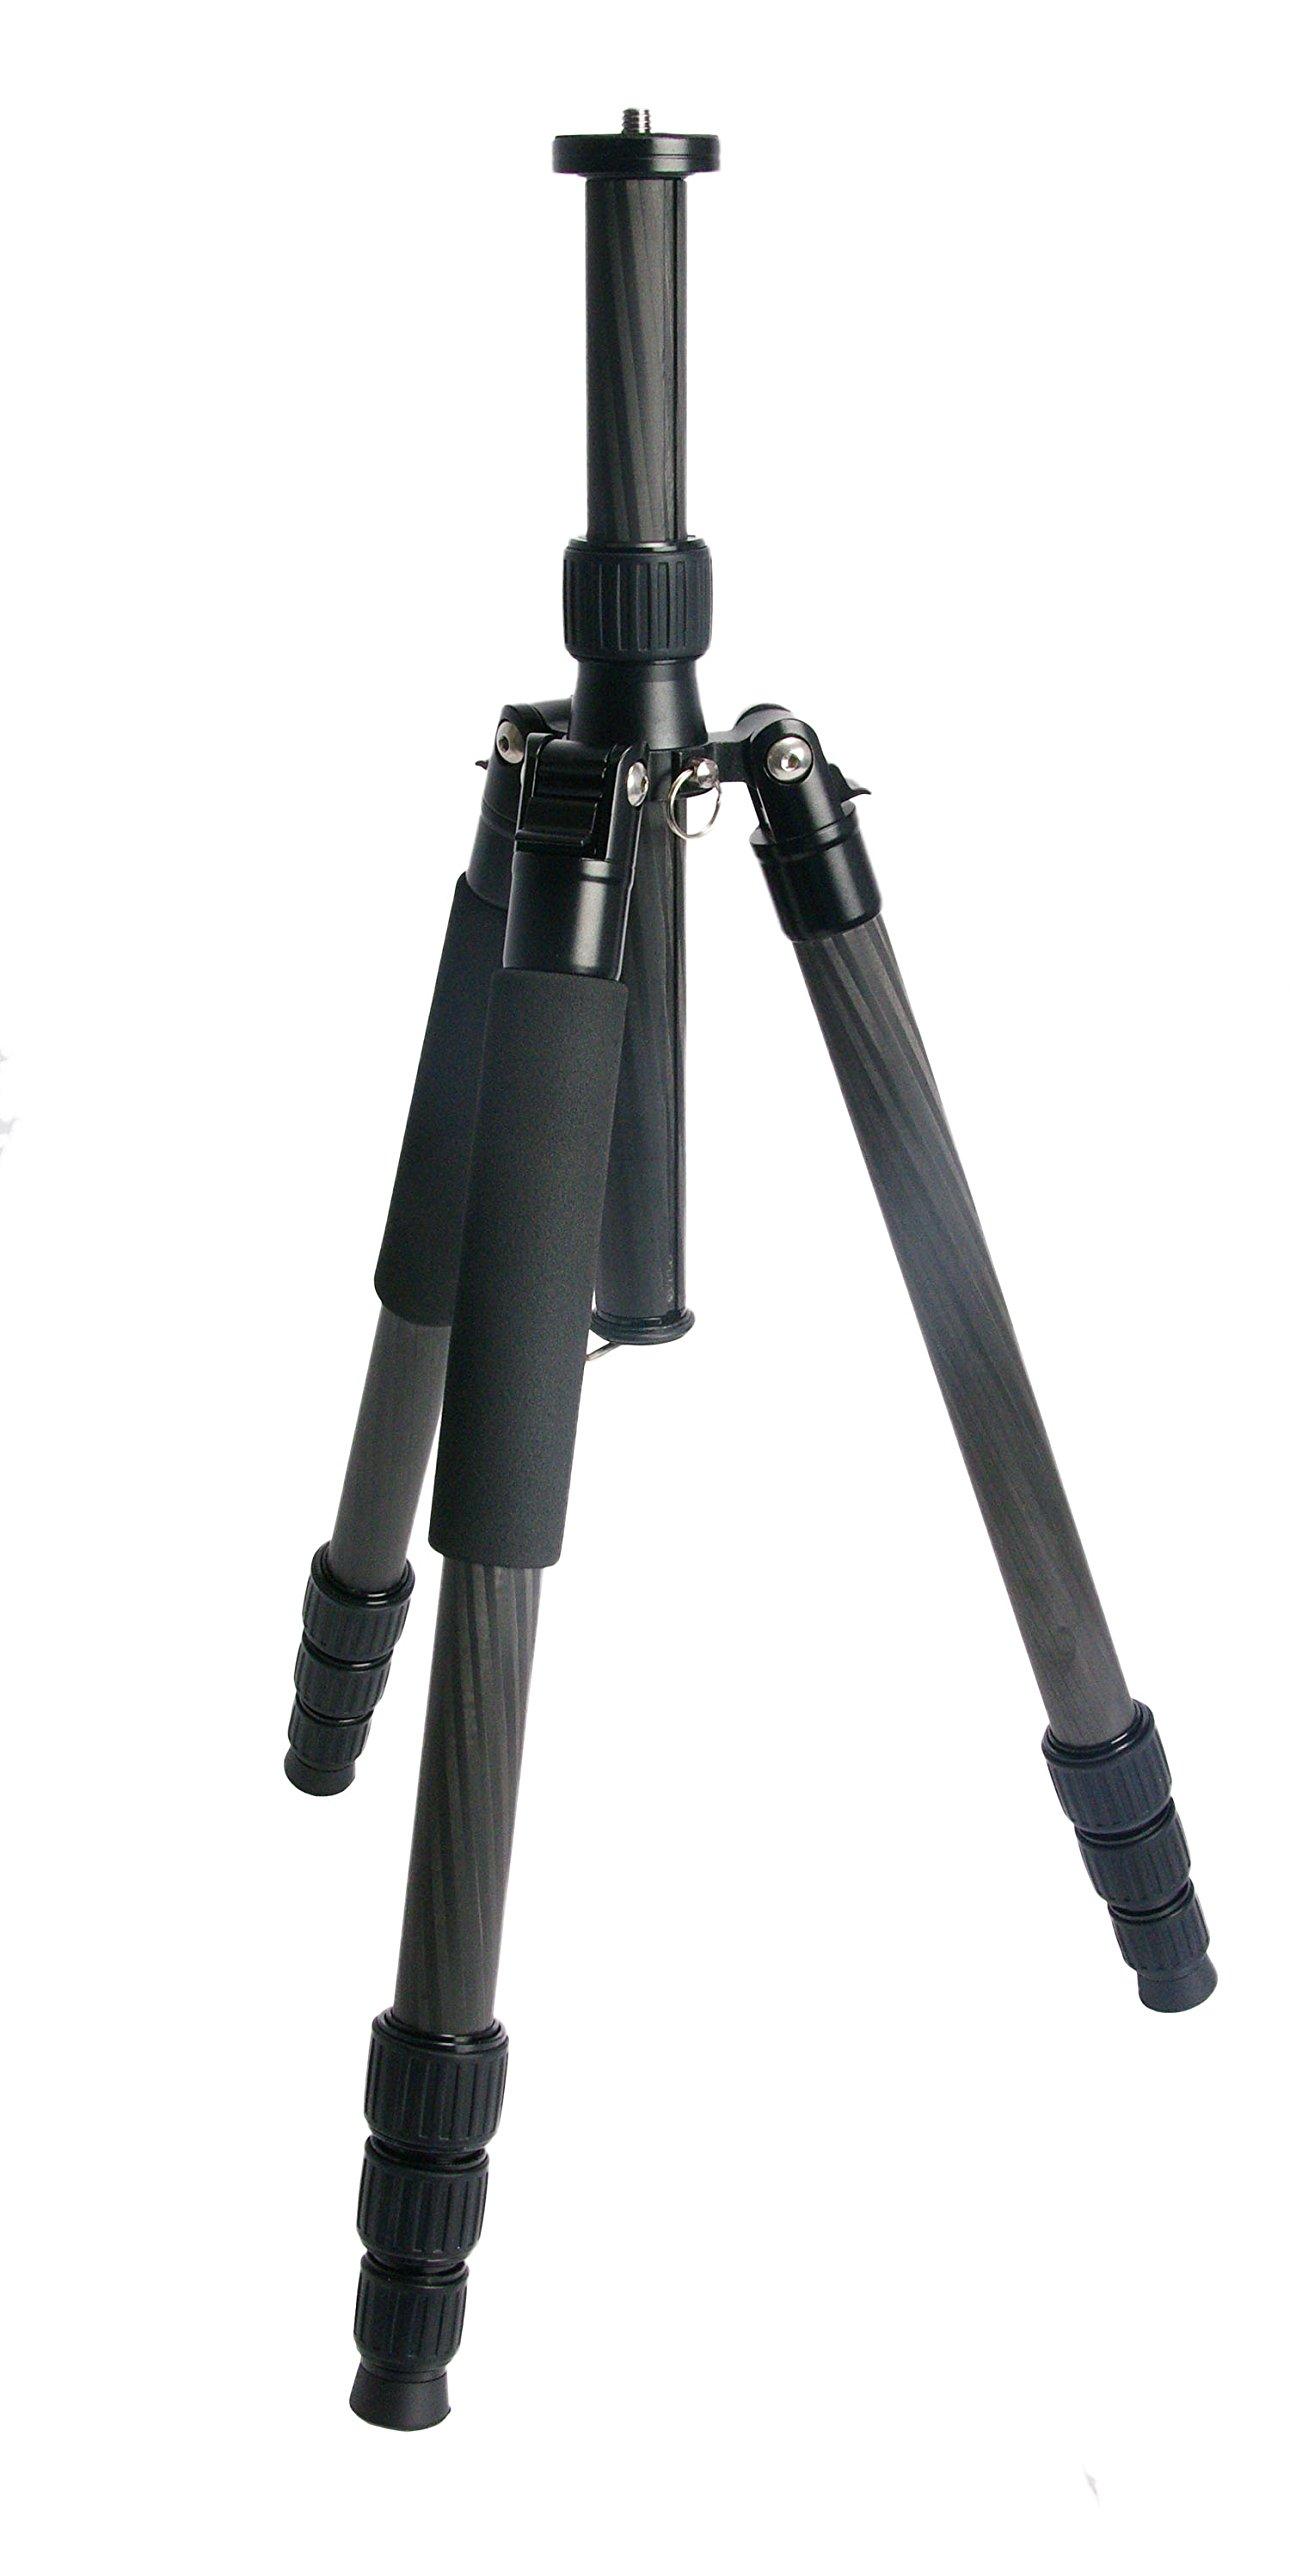 TERRA FIRMA TRIPODS T-CF450 Carbon Fiber 4 Section Tripod Leg Set, Black by TERRA FIRMA TRIPODS (Image #14)